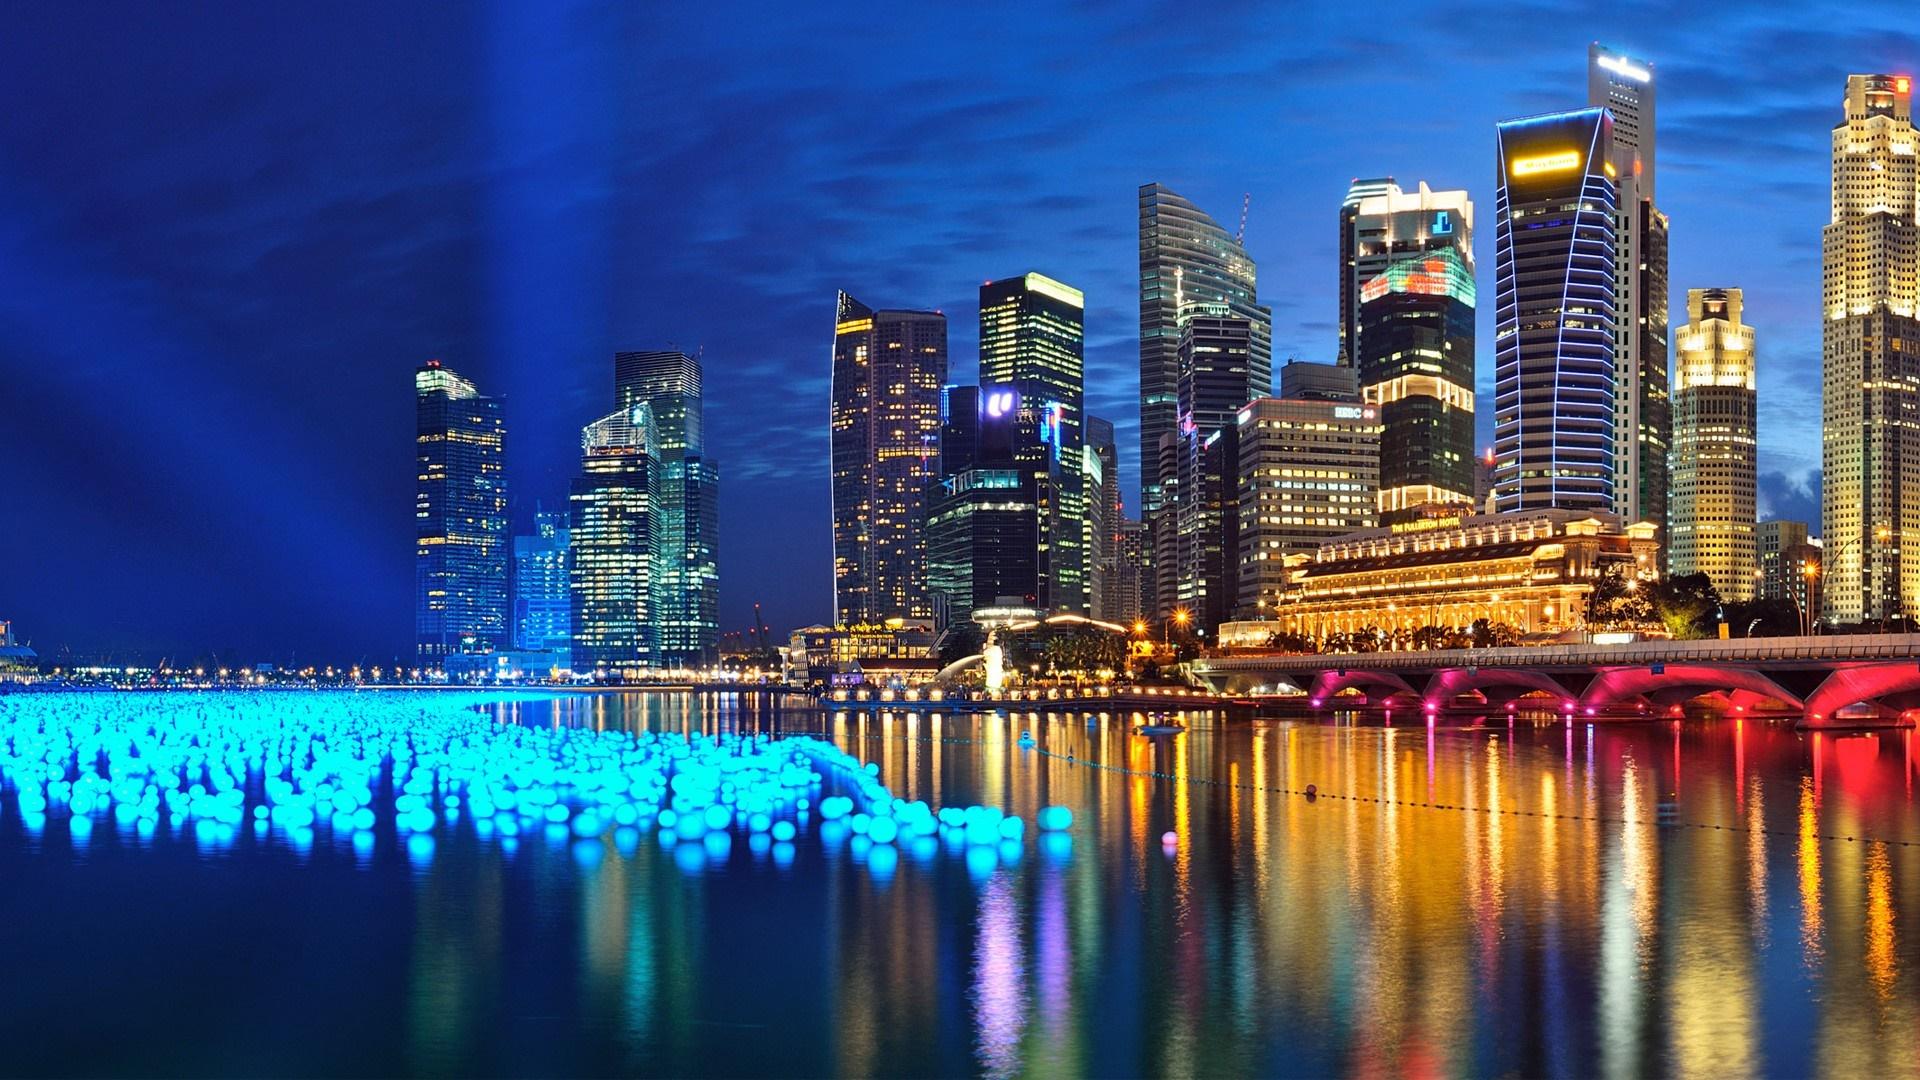 Marina Bay, Singapore wallpaper